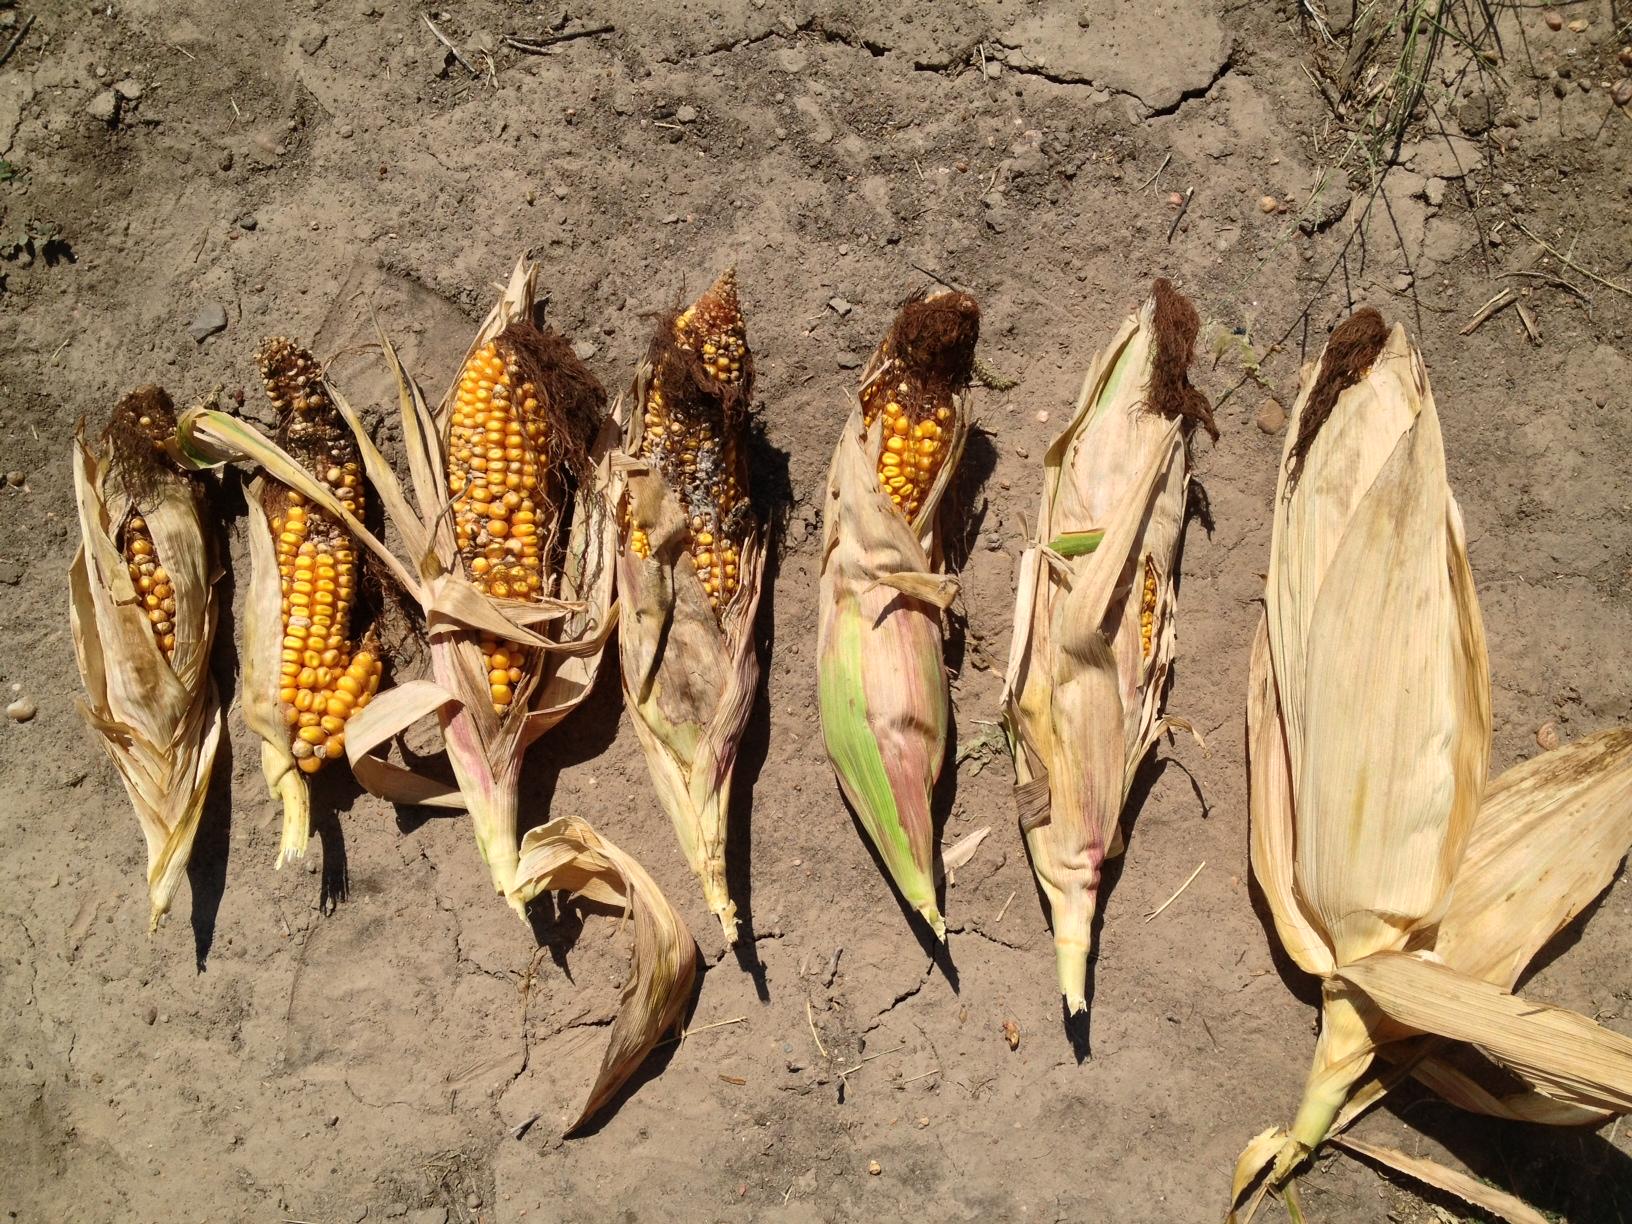 Stinkbug damage on corn